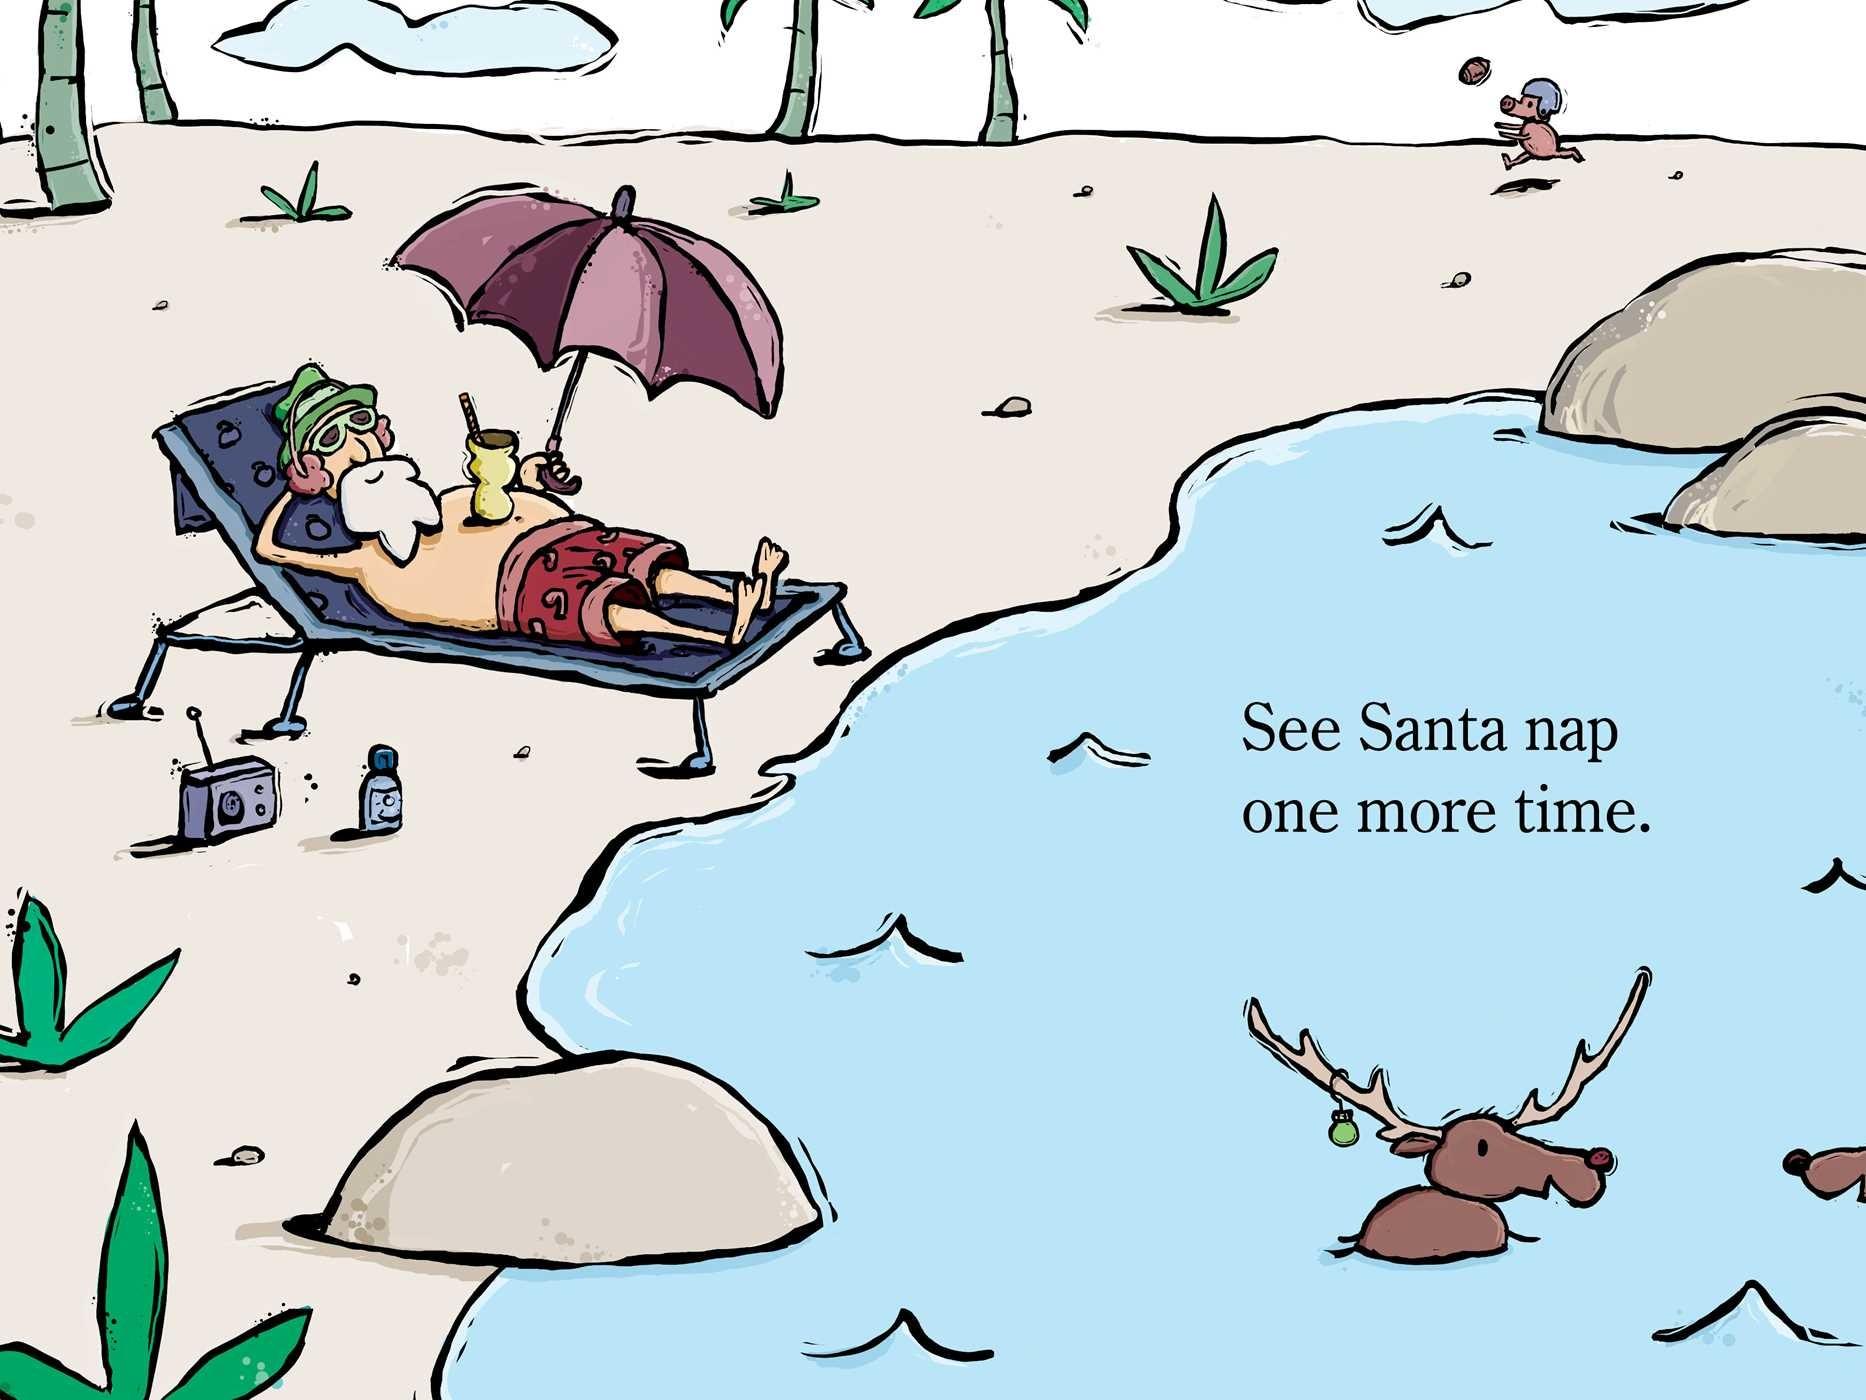 See santa nap 9781481467872.in06